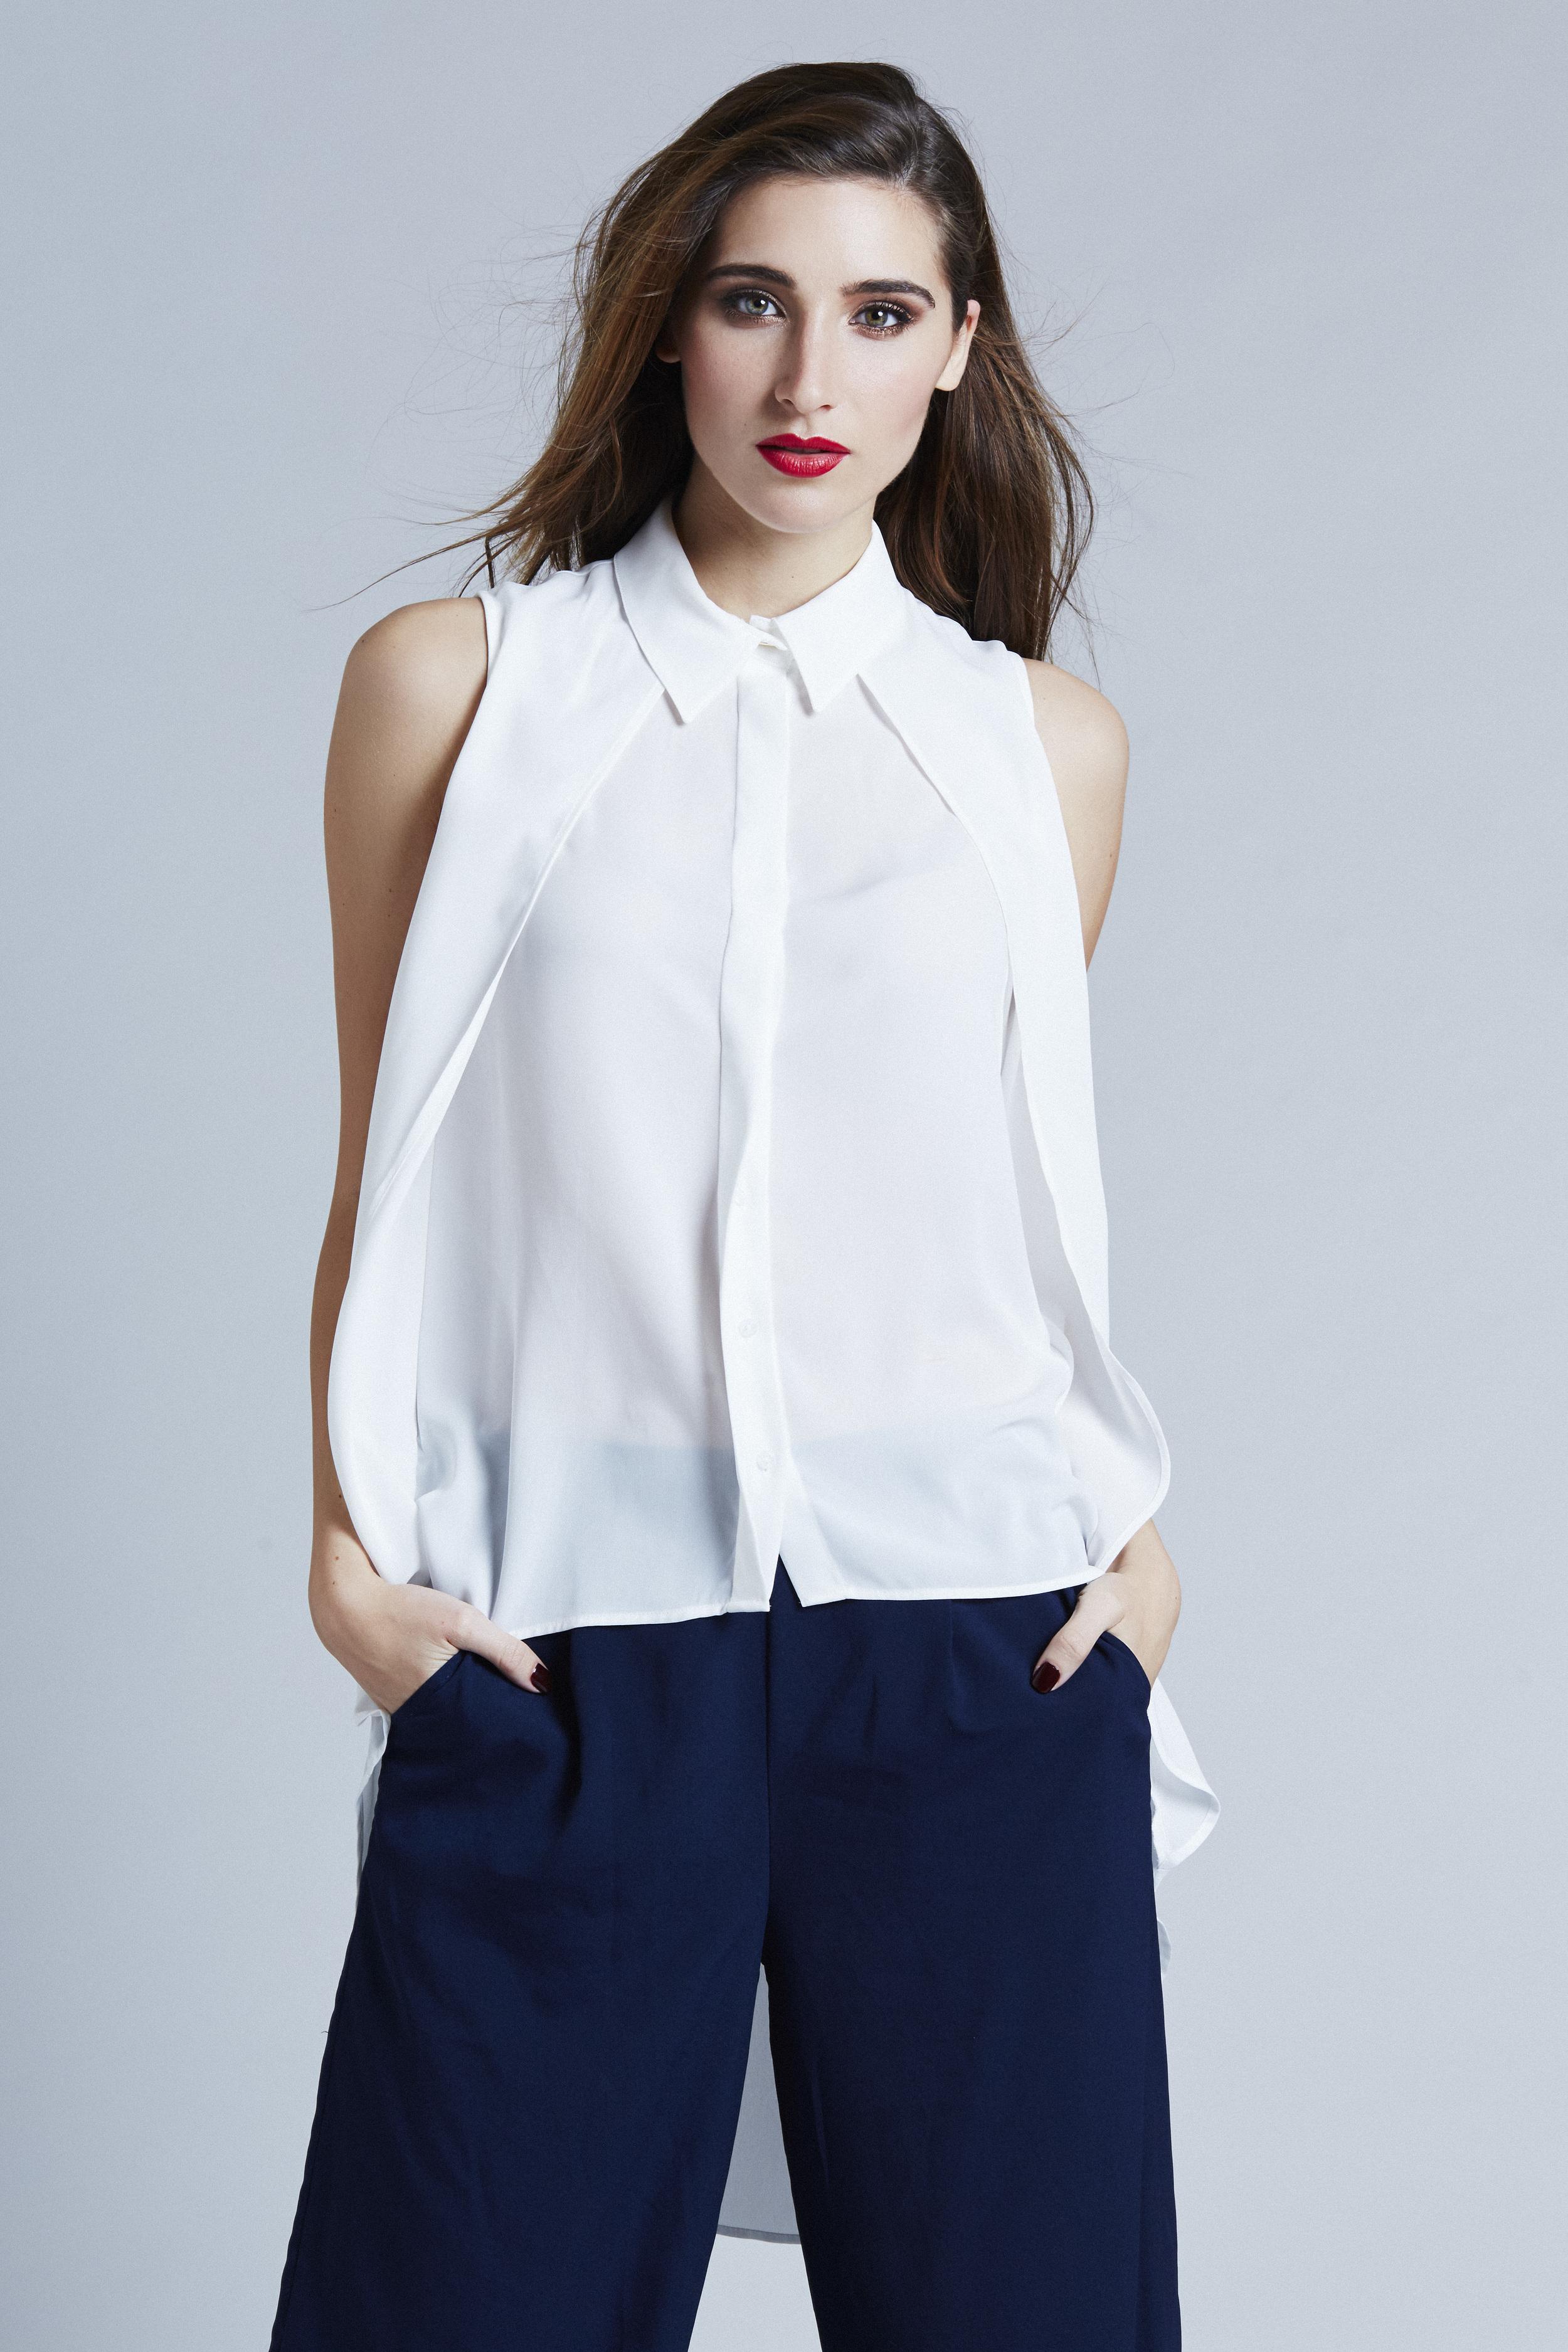 Blouse: Zara / Pant: M for Mendocino